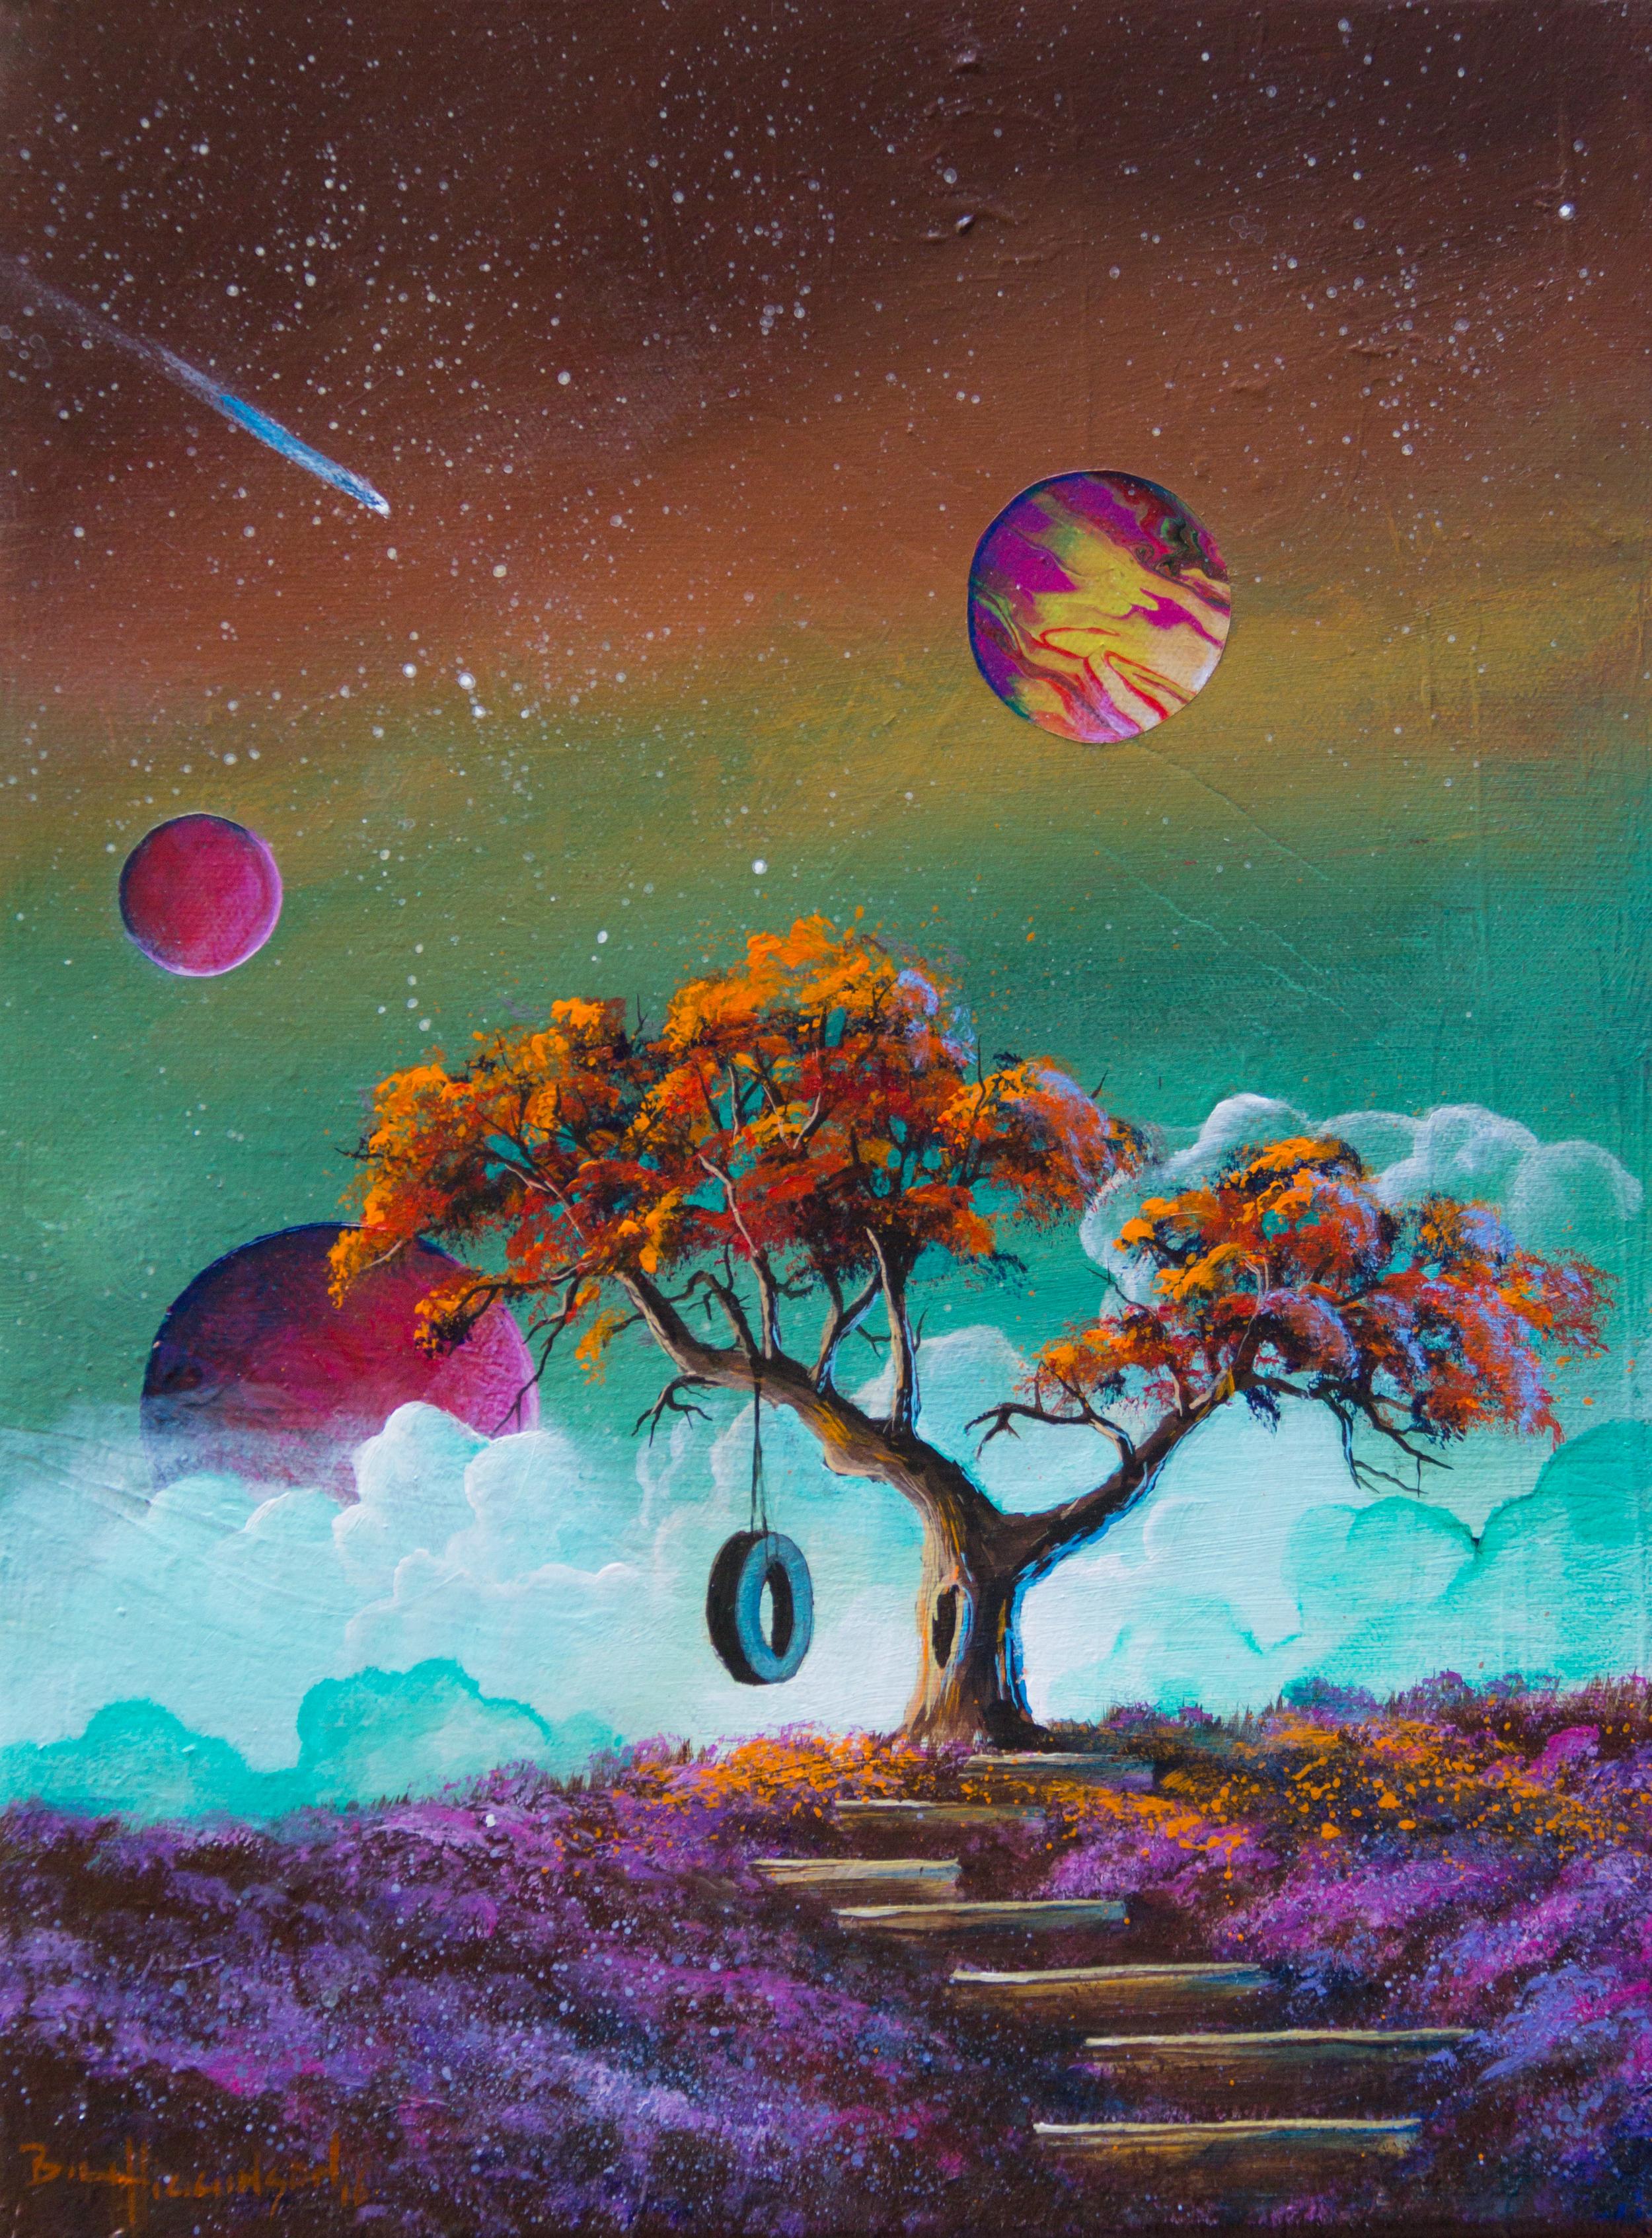 bill-higginson/art/front-row-seats/childrens-fantasy-landscape-surrealism